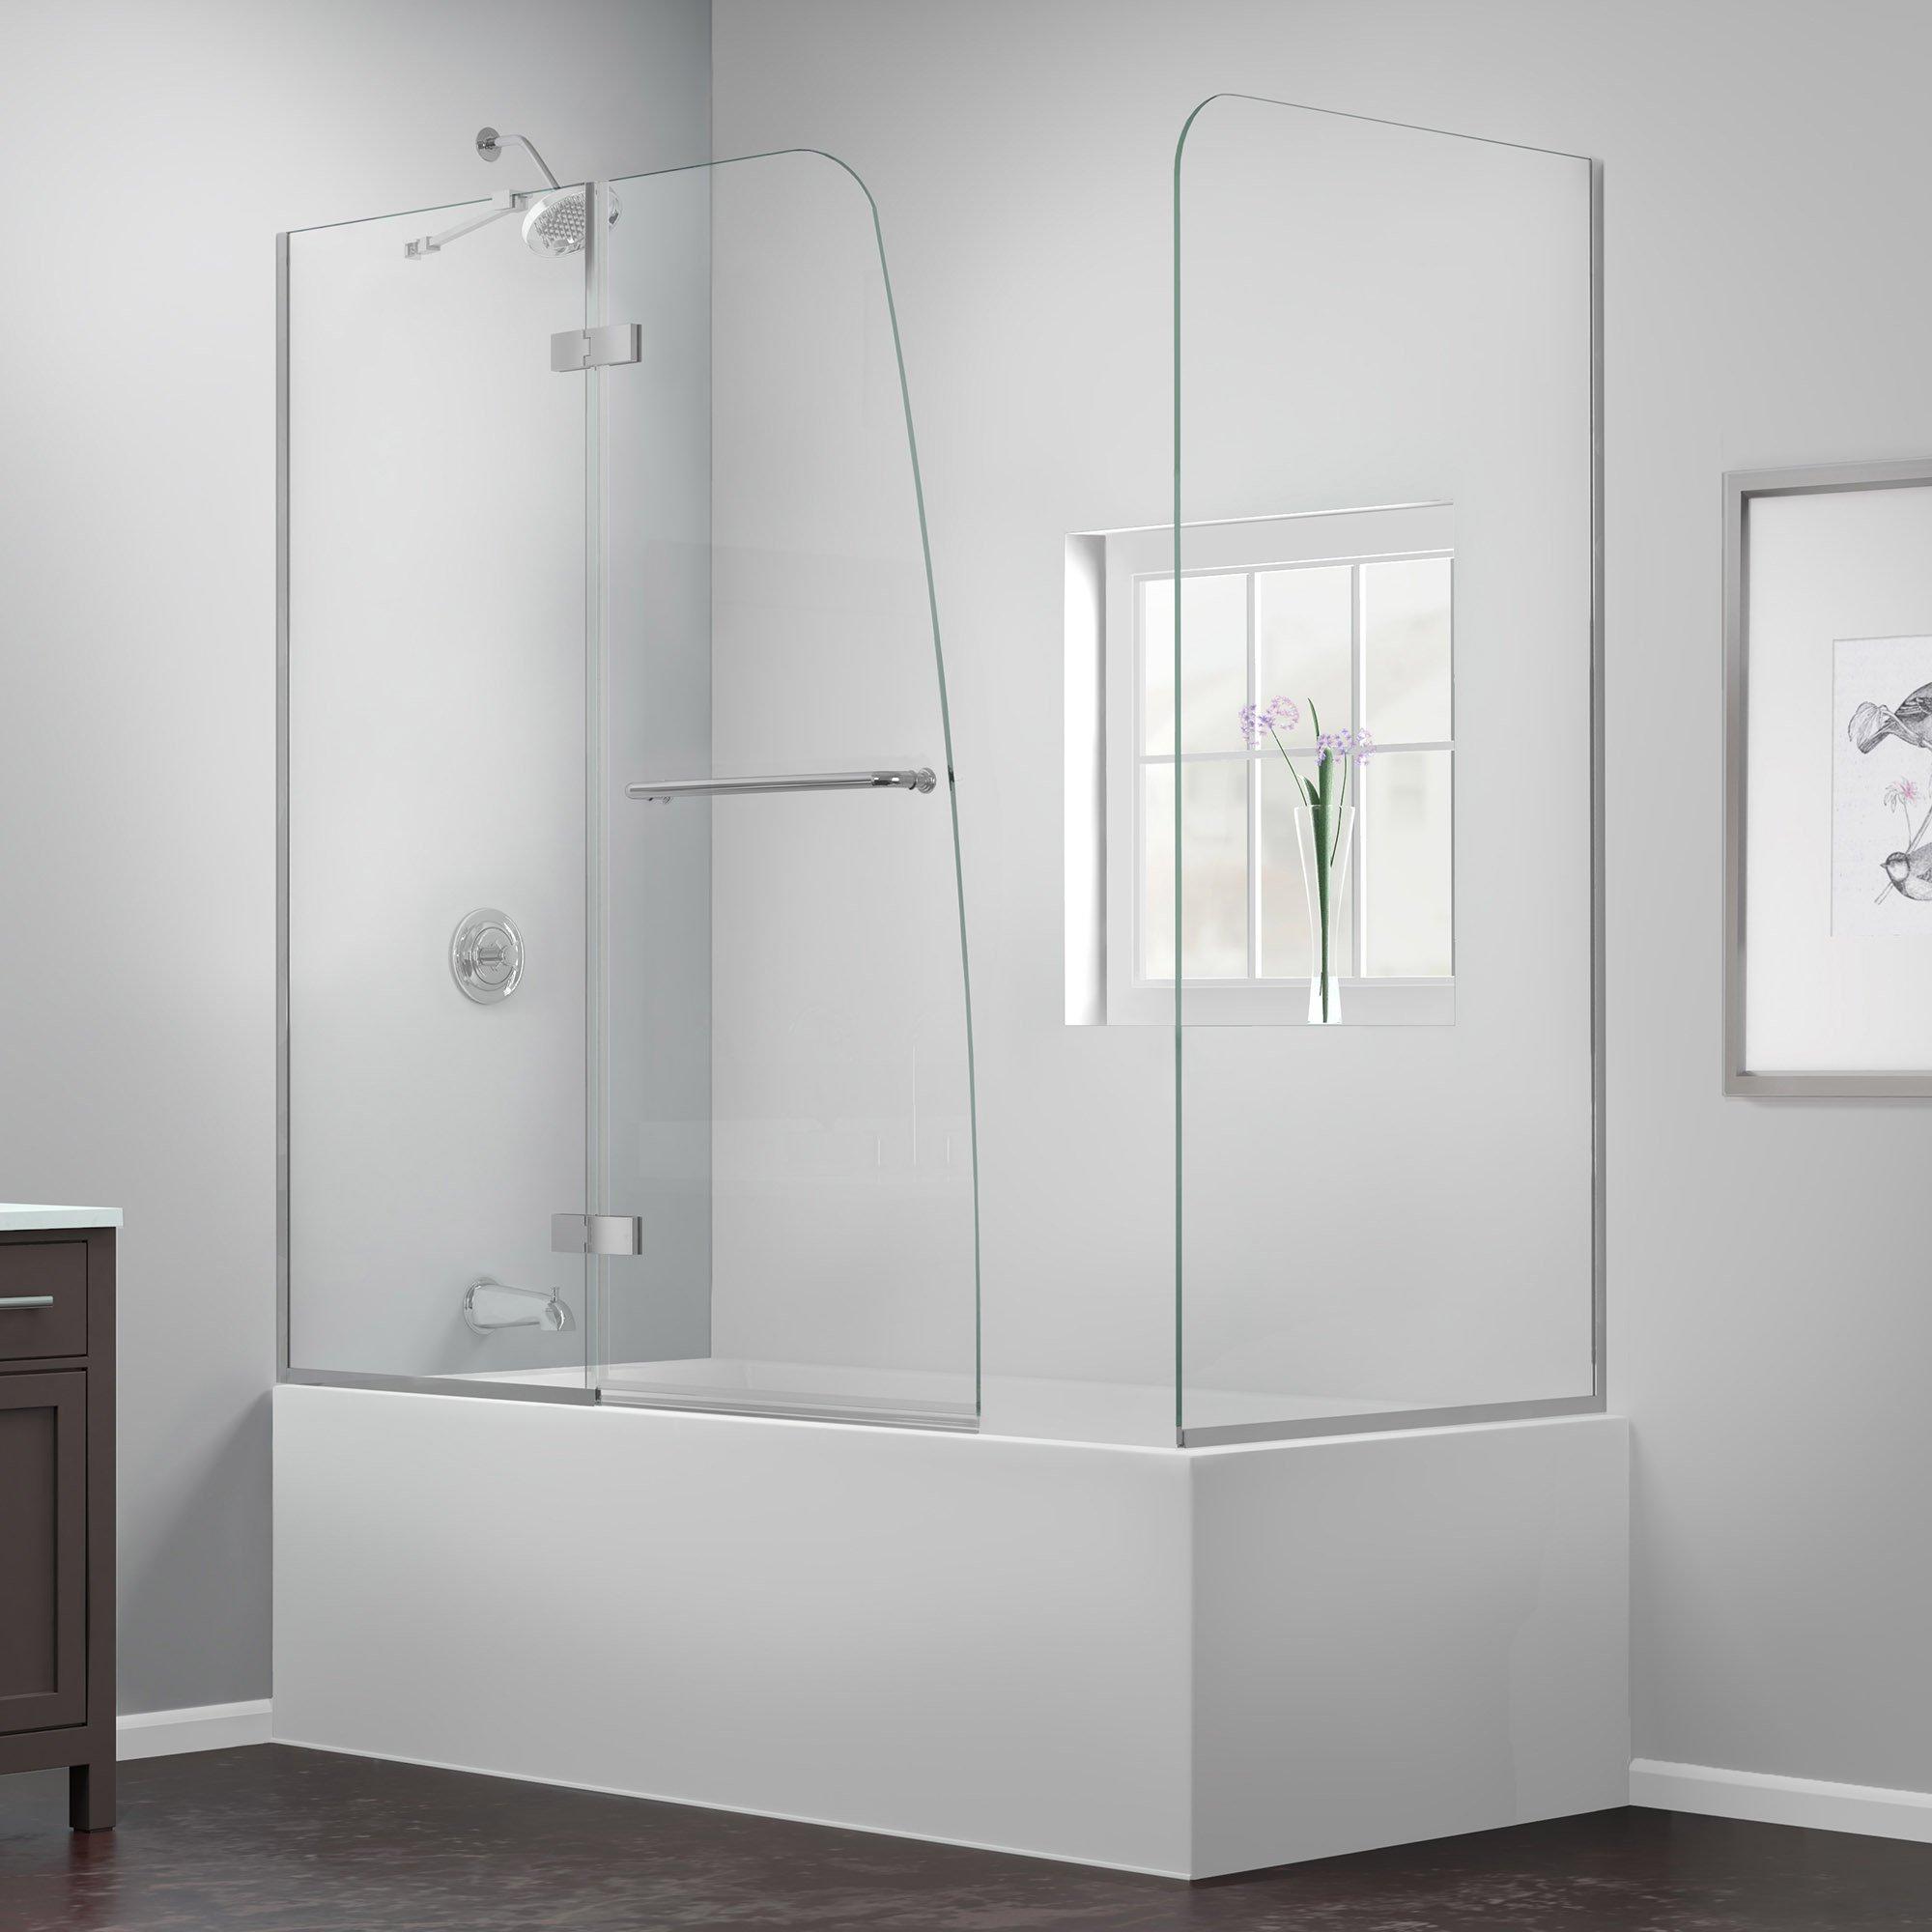 DreamLine Aqua Ultra 57-60 in. Width, Frameless Hinged Tub Door, 5/16'' Glass, Chrome Finish by DreamLine